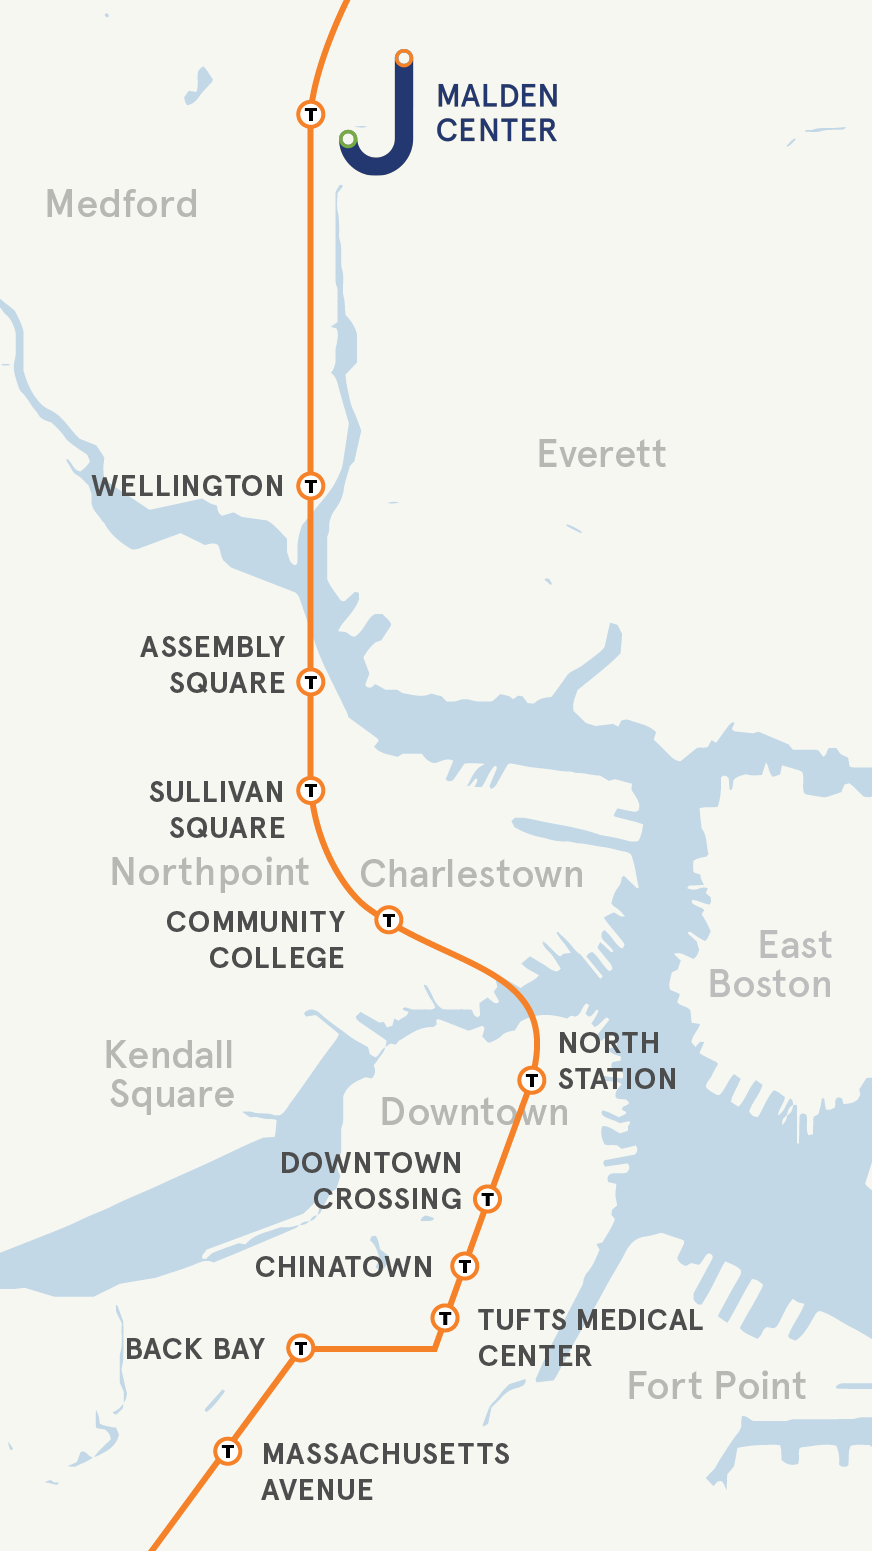 Visual Map of Malden